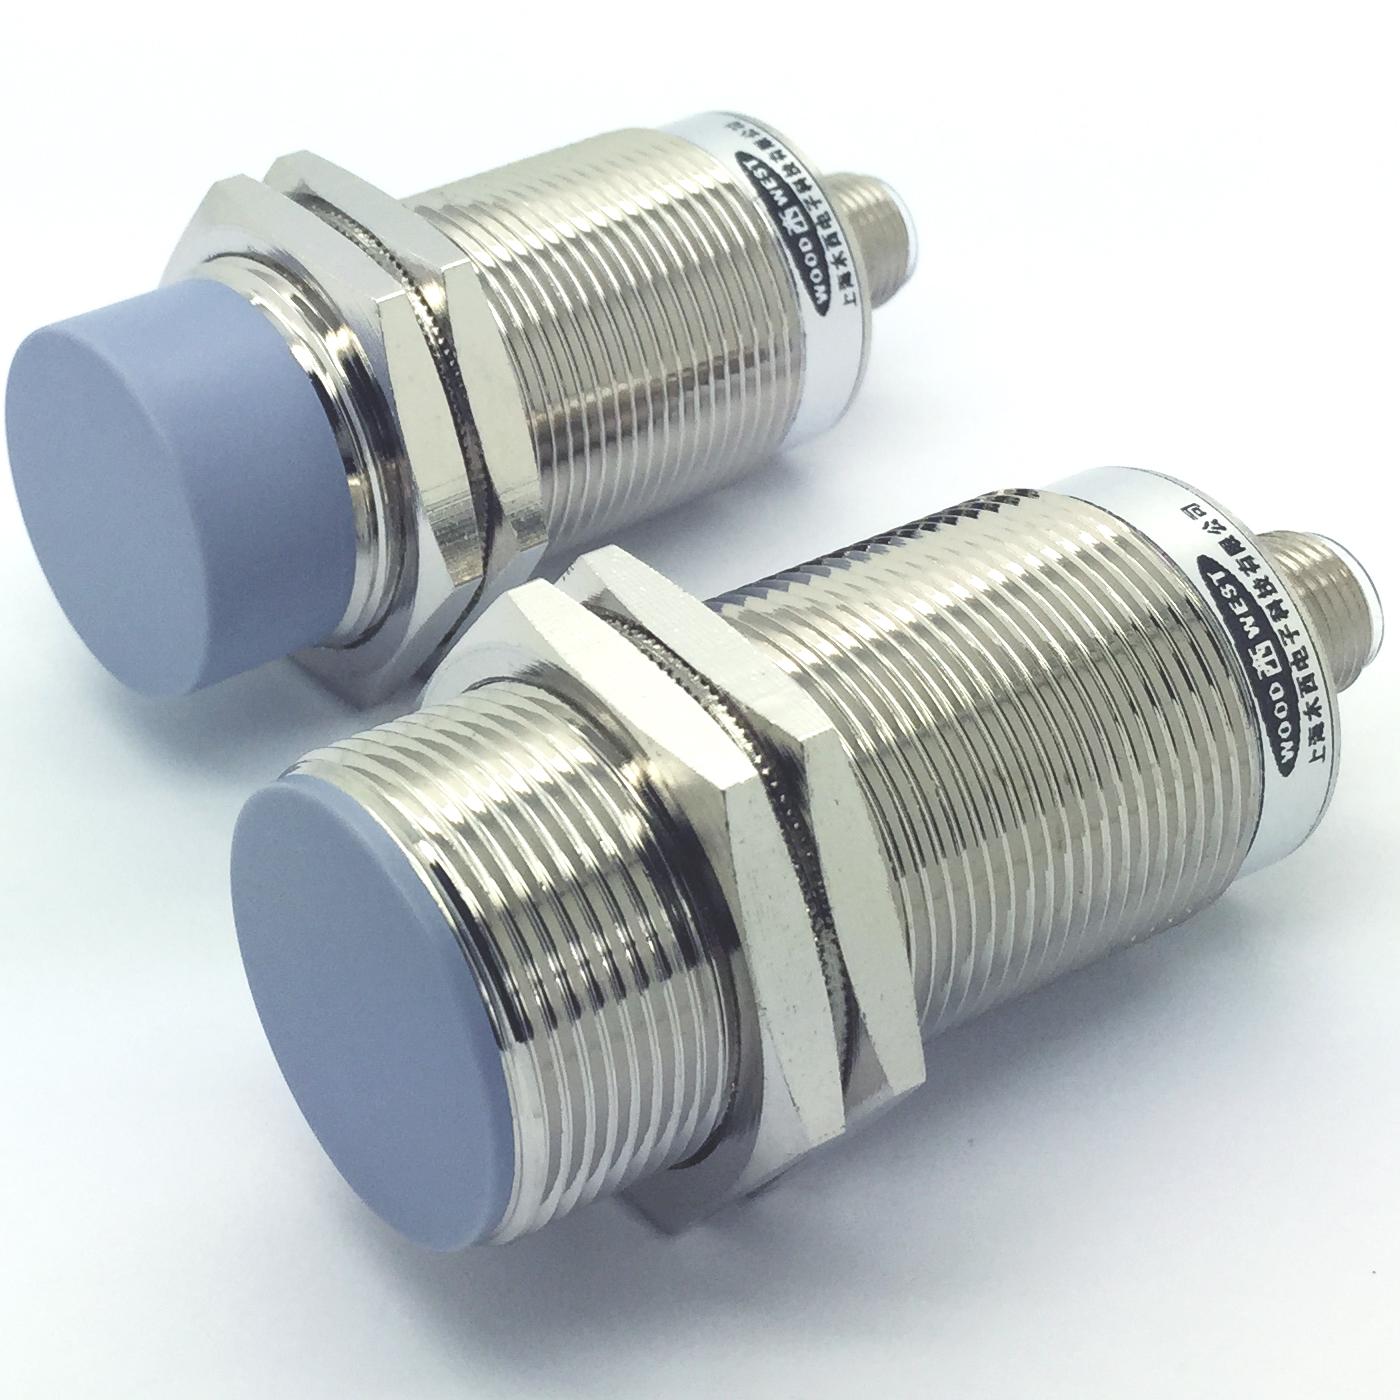 M30 inductance sensor, close to switch,analog output sensor